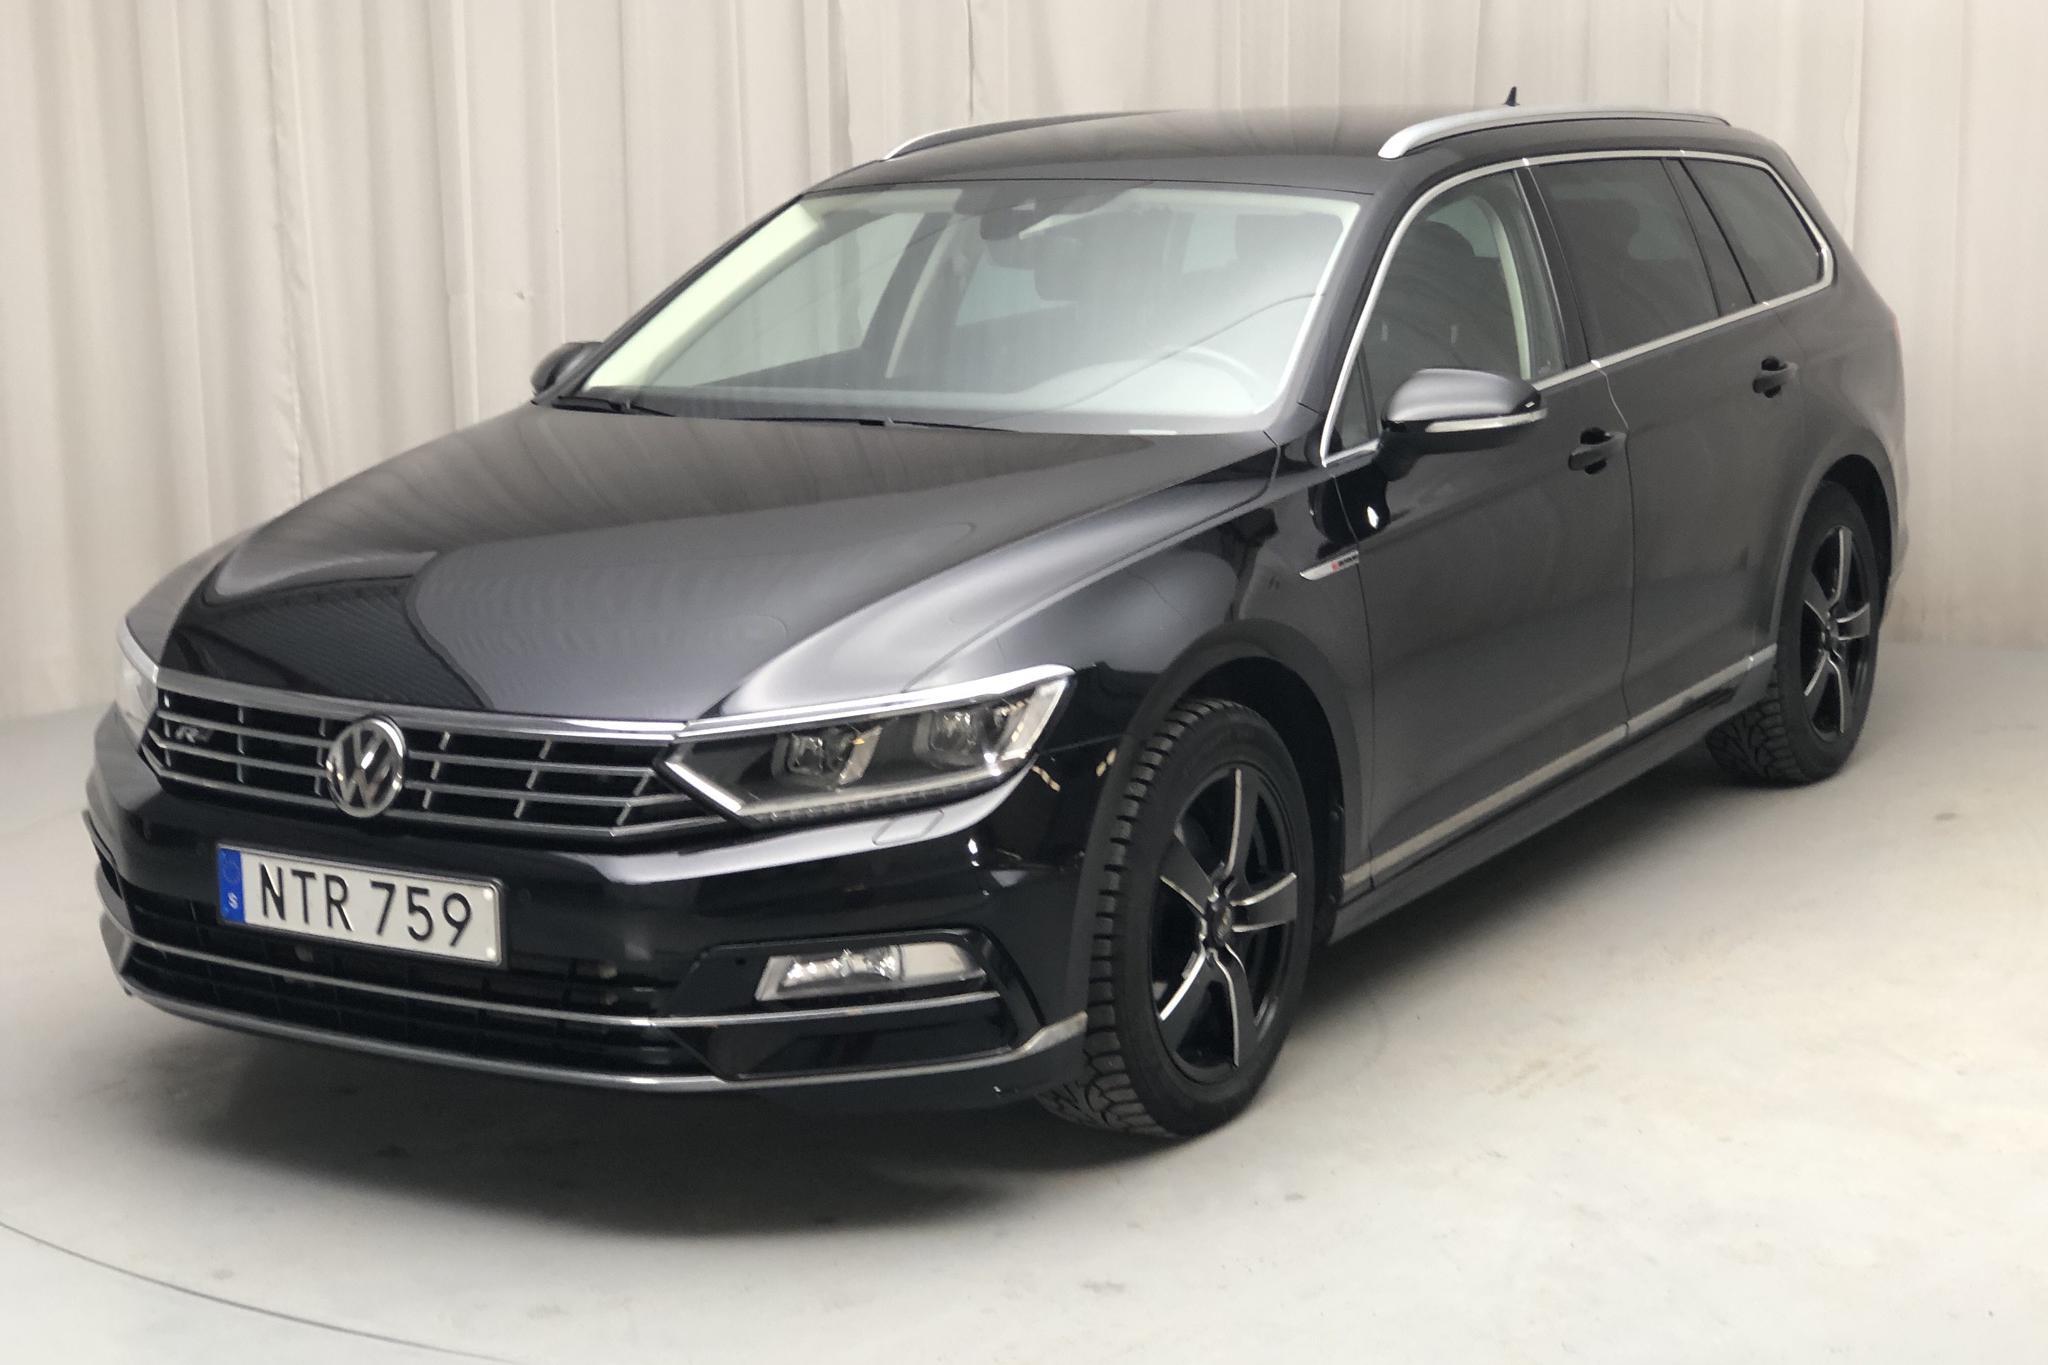 VW Passat 2.0 TDI Sportscombi 4MOTION (190hk) - 7 358 mil - Automat - svart - 2018